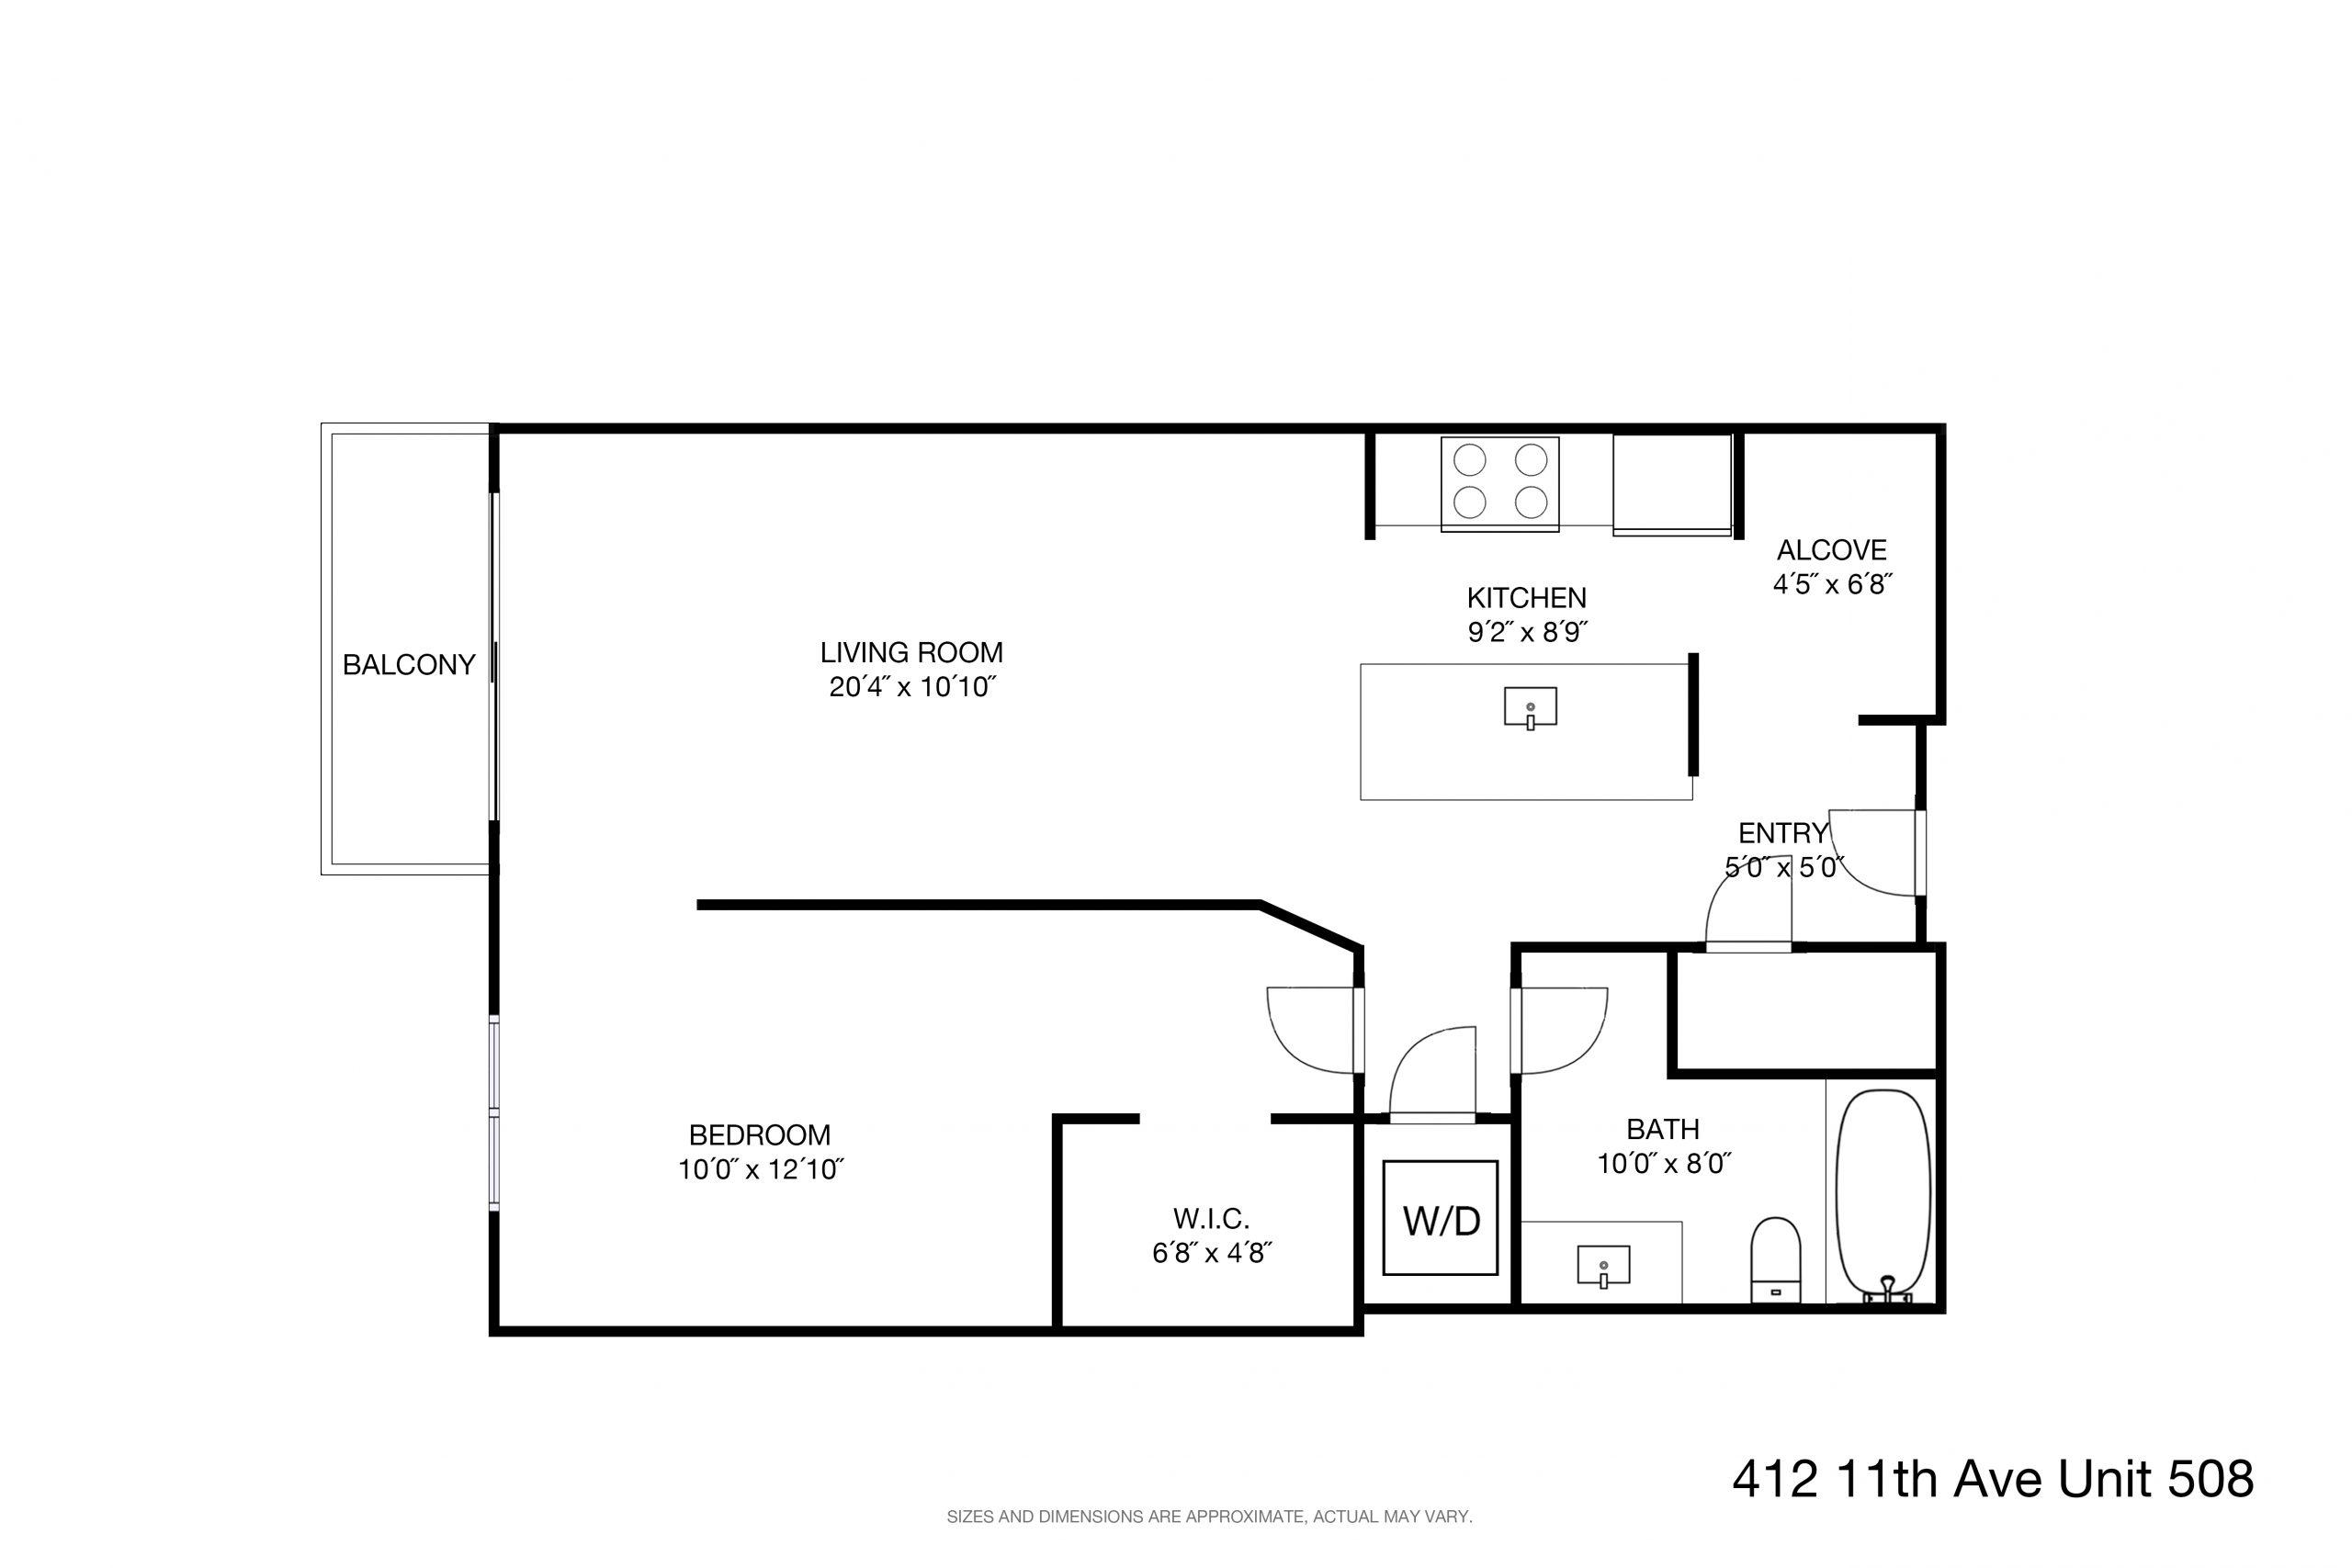 Floor Plan(dimensions) - 412 11th Avenue Unit 508